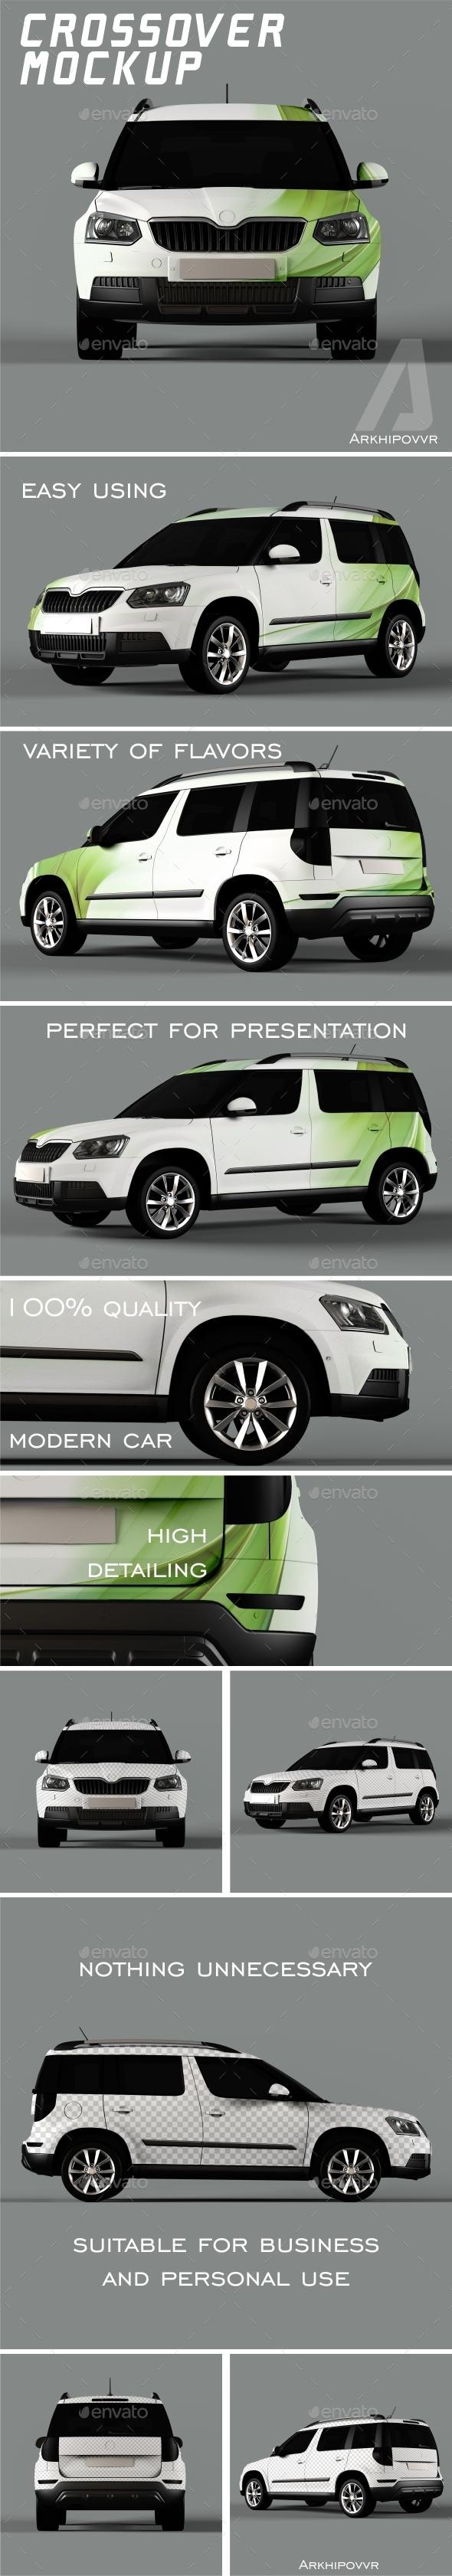 Crossover mockup - Product Mock-Ups Graphics